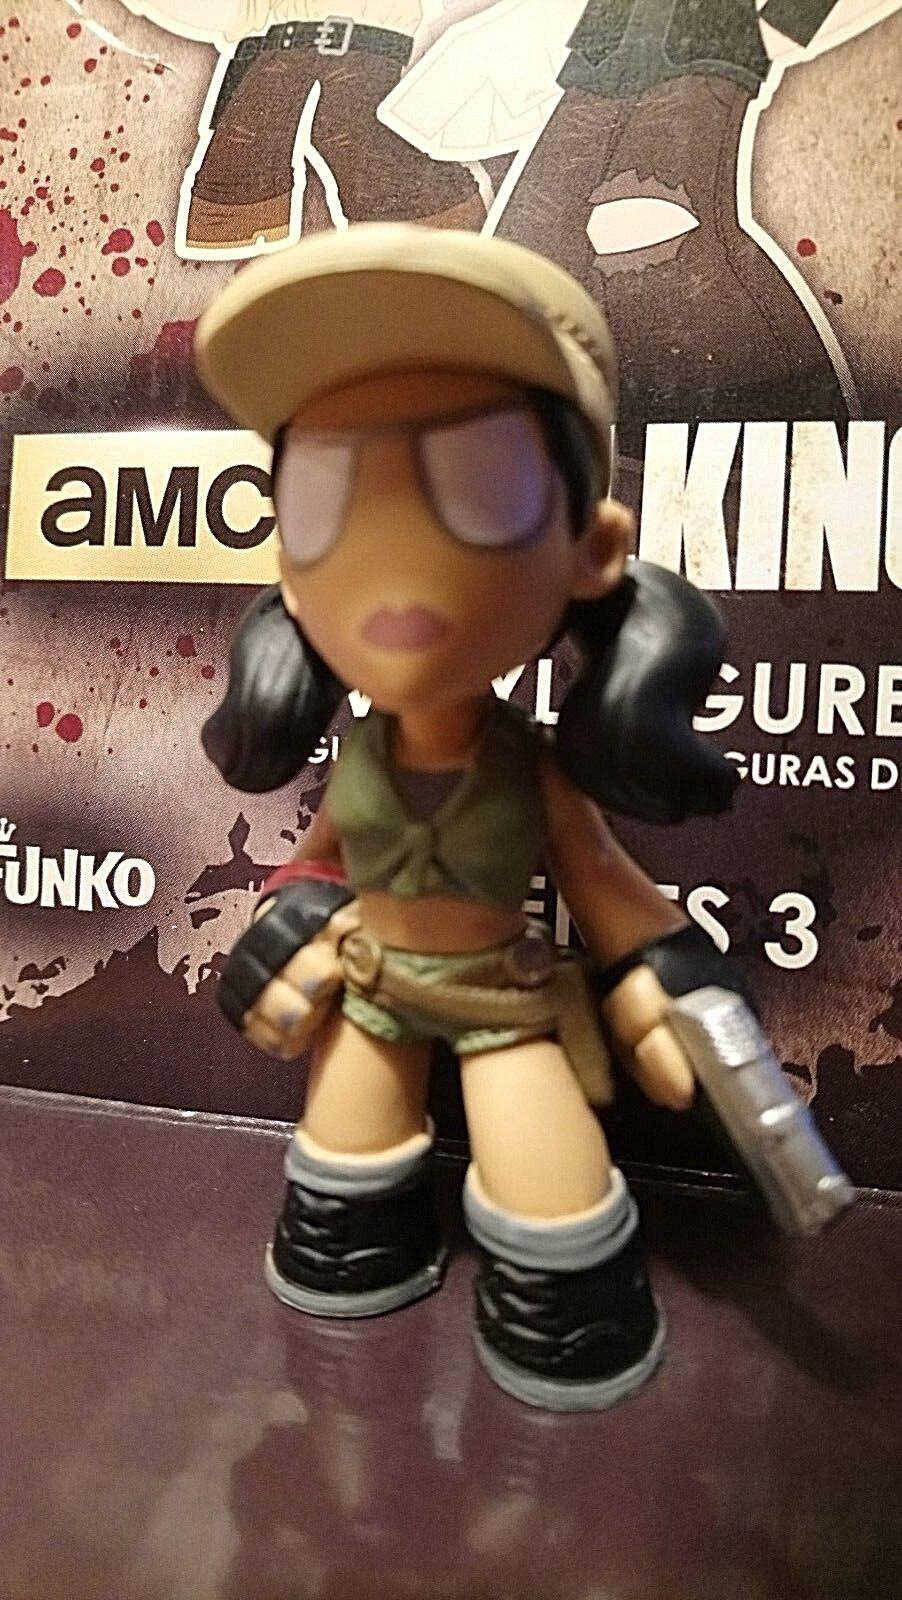 entrega gratis The Walking Walking Walking Dead FUNKO Misterio Mini serie 3 ROSITA HOT TOPIC Raro  ofrecemos varias marcas famosas